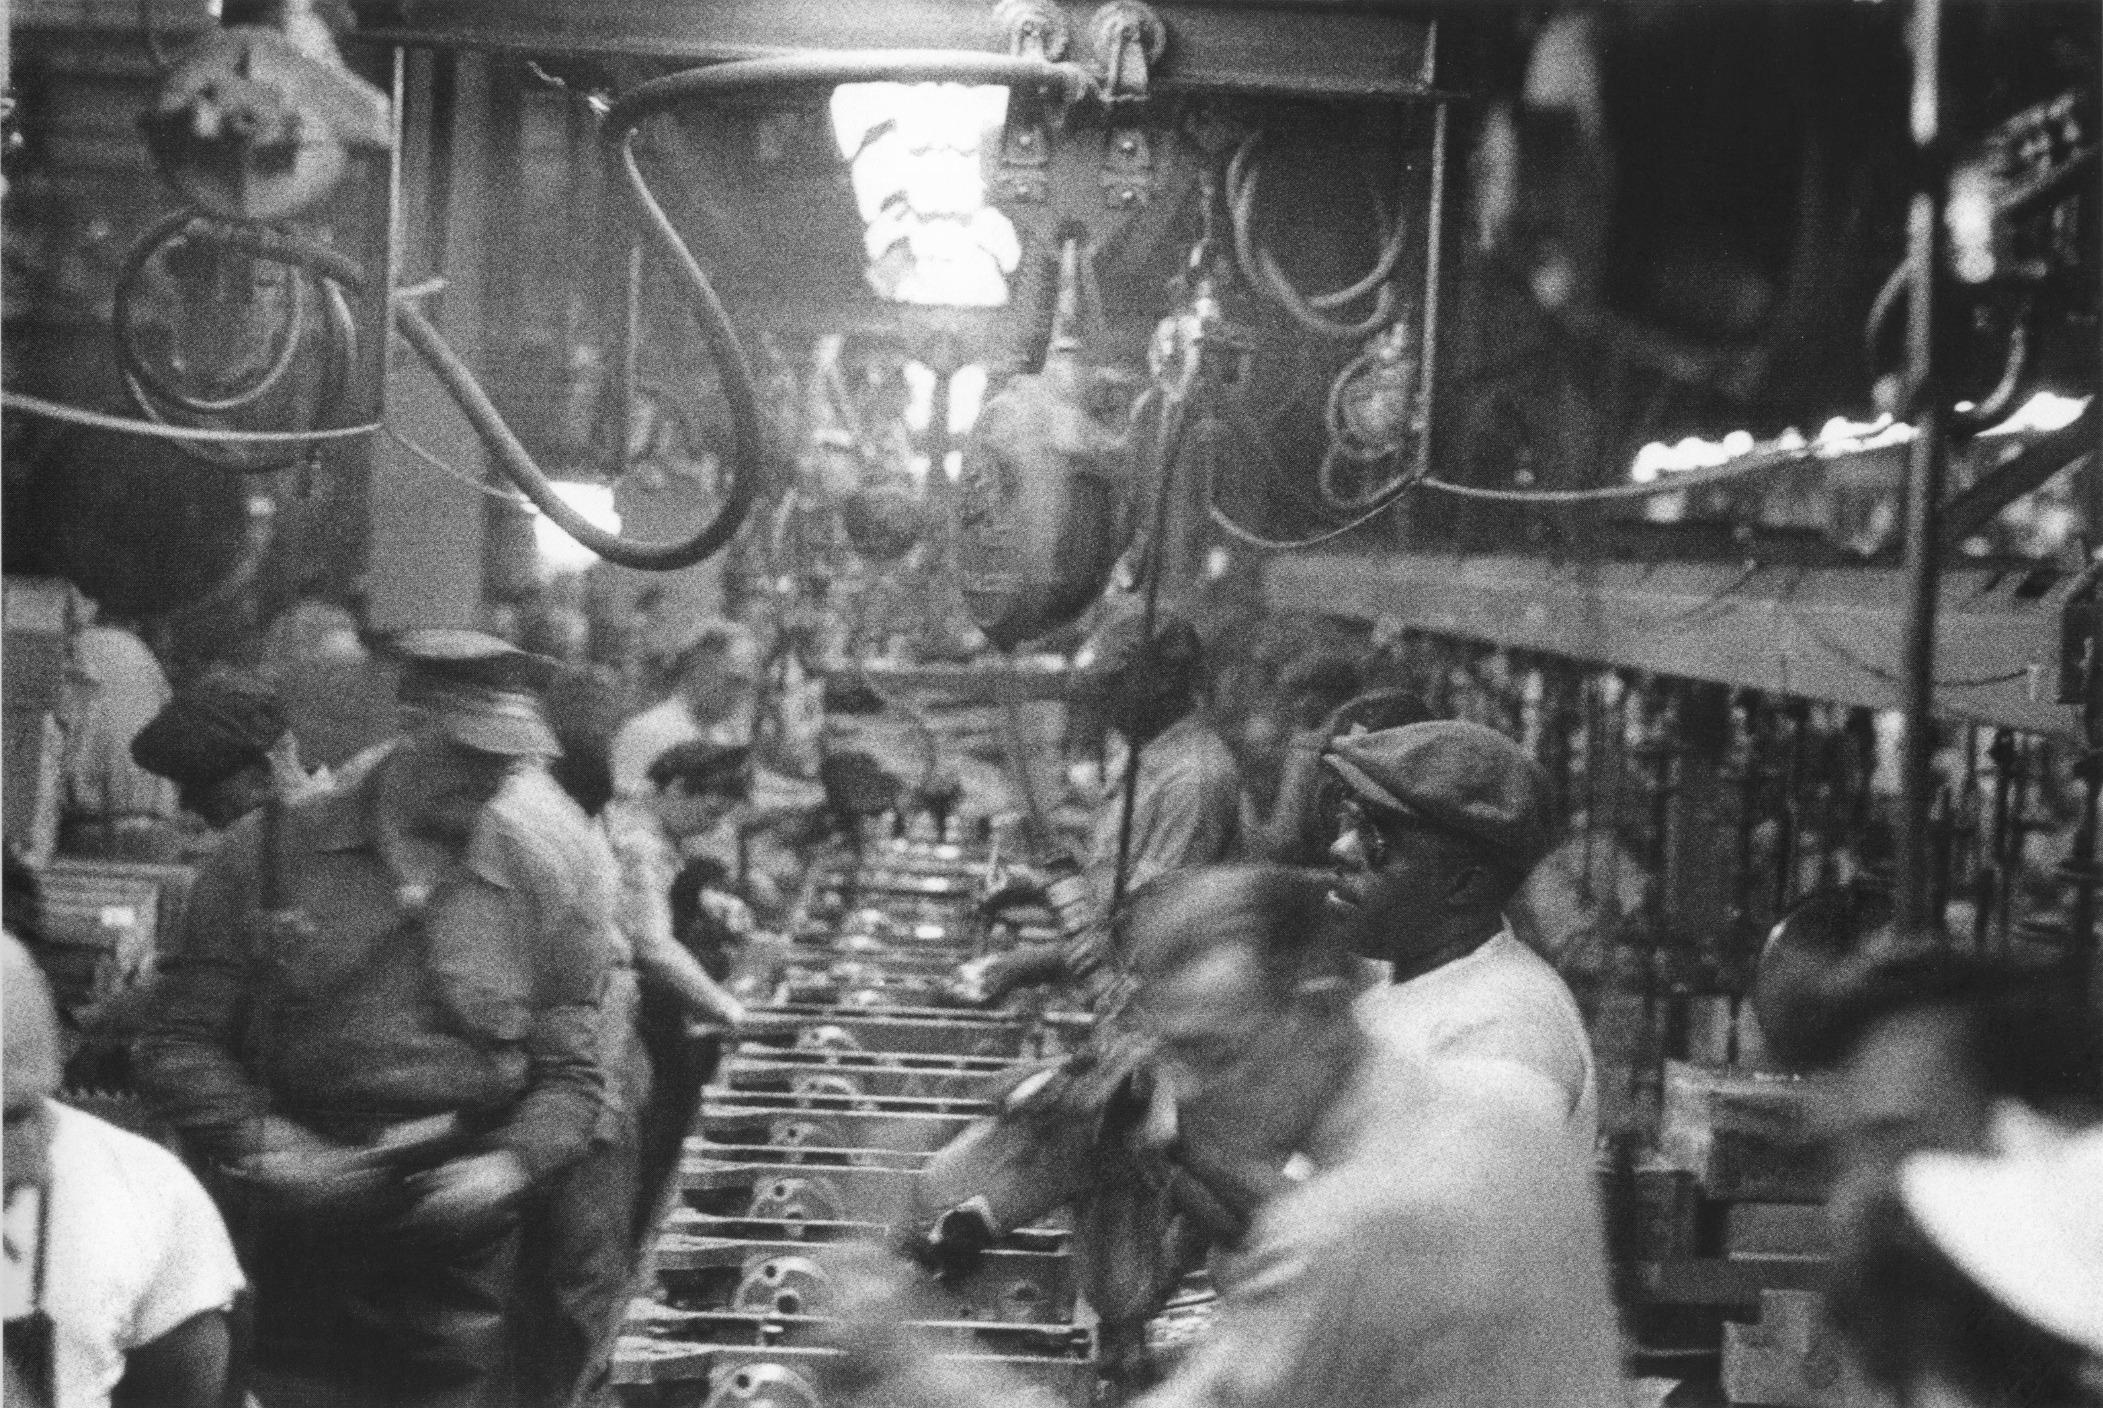 #50 Assembly line - Detroit, 1955